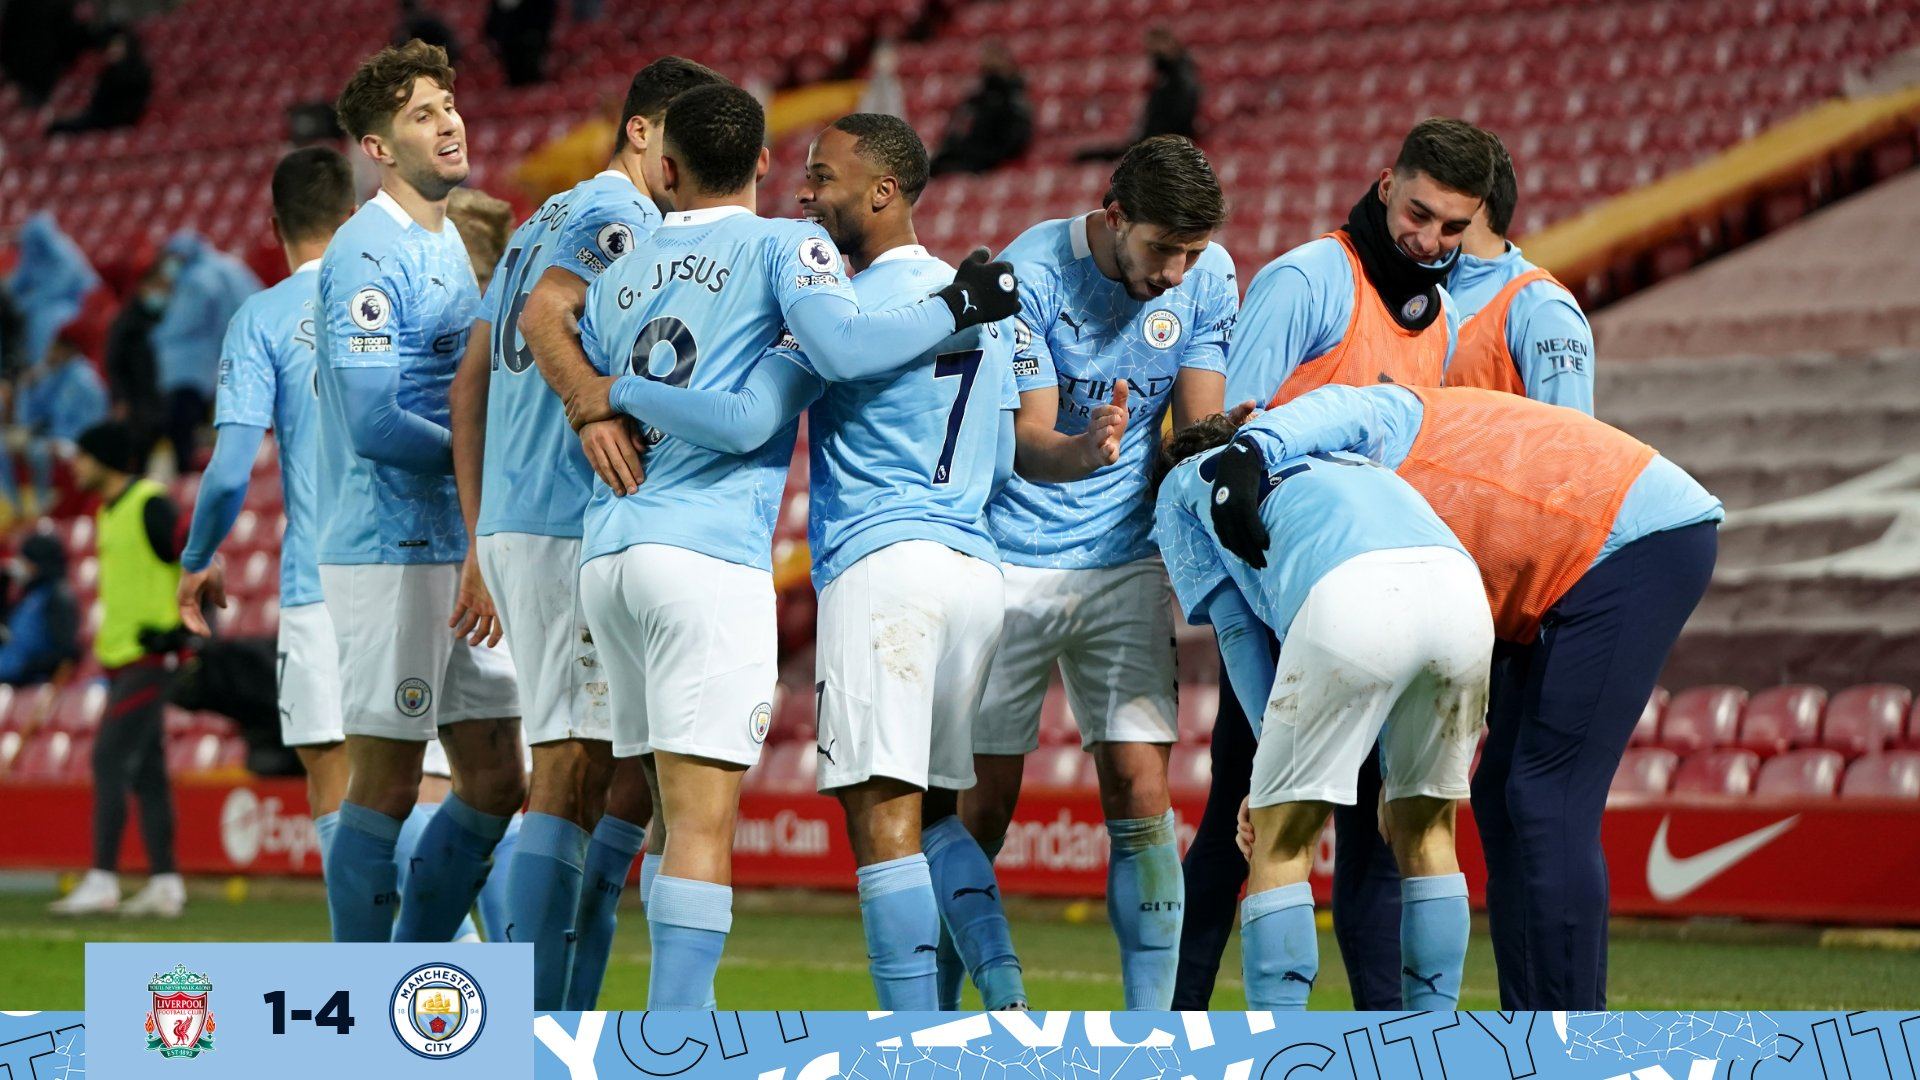 Manchester City [PHOTO CREDIT: @ManCity]